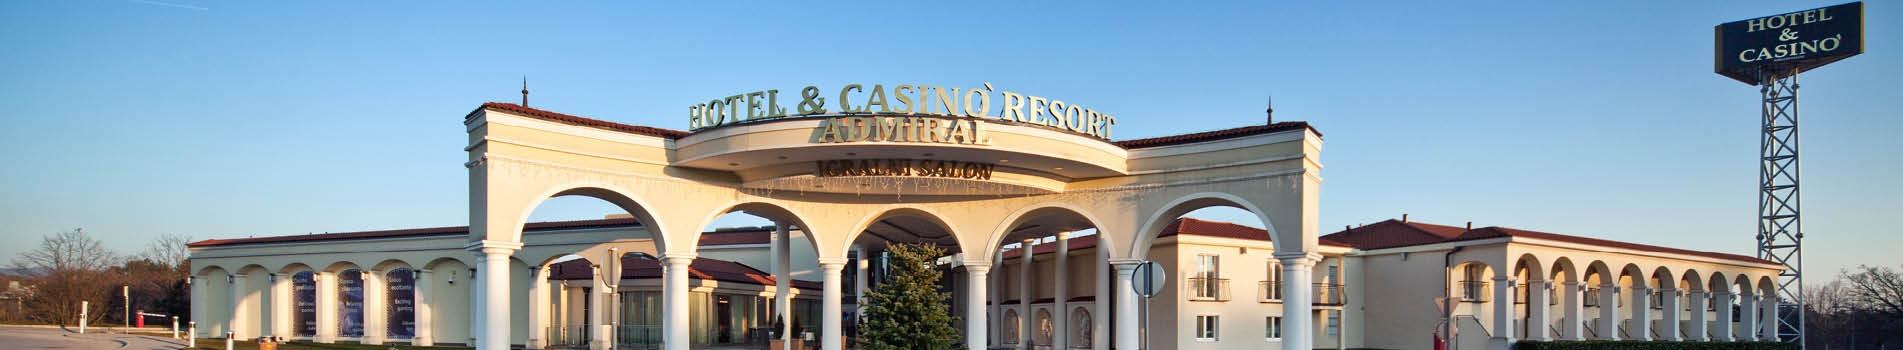 Casino admiral ptuj